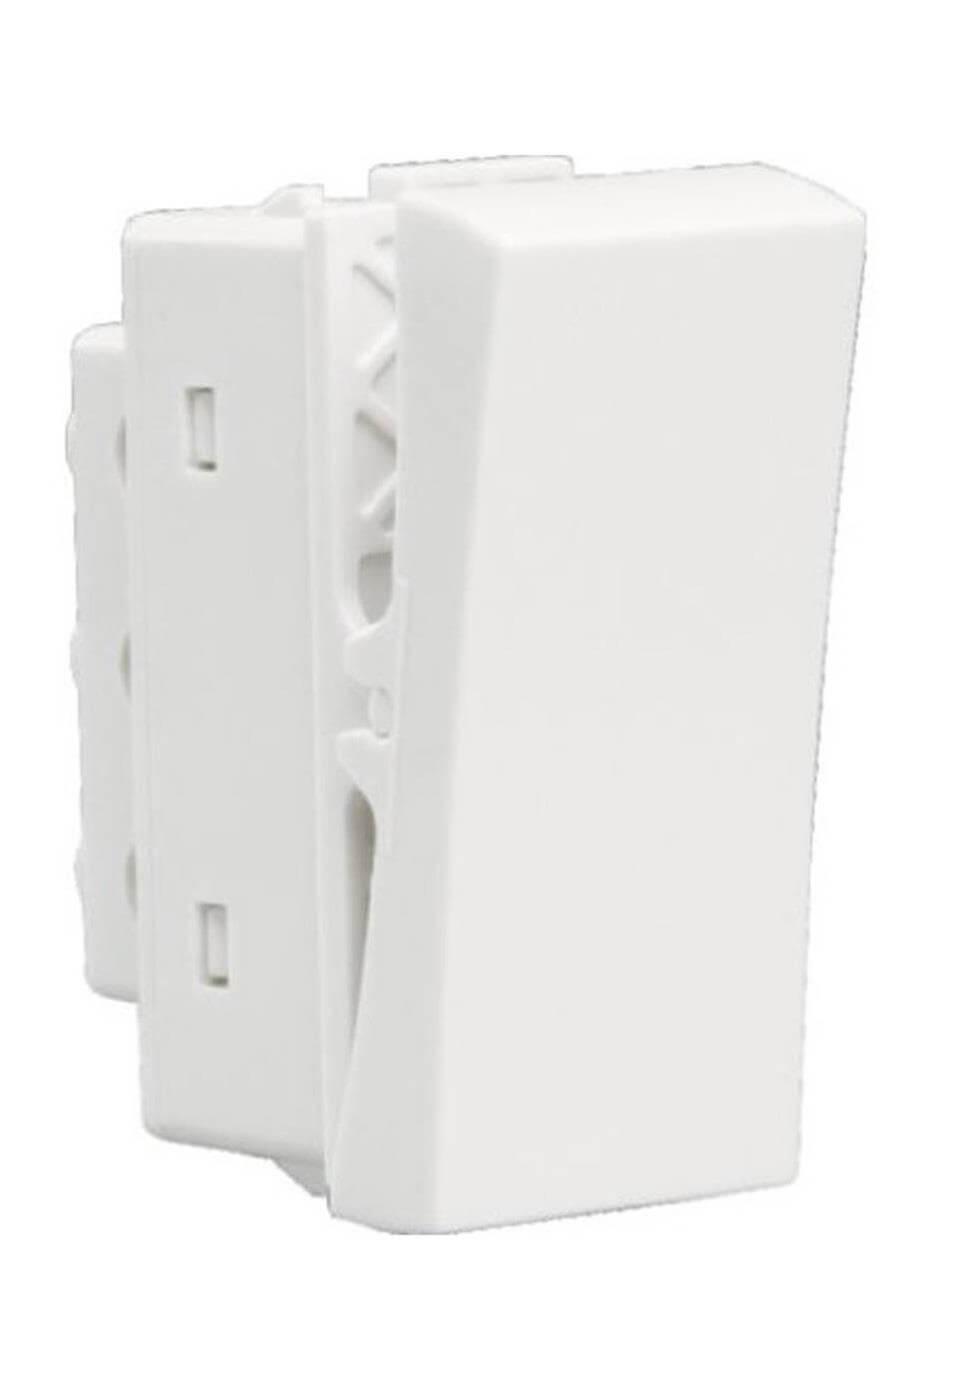 Havells Crabtree Athena - One Way Switch 10A Mega Indicator